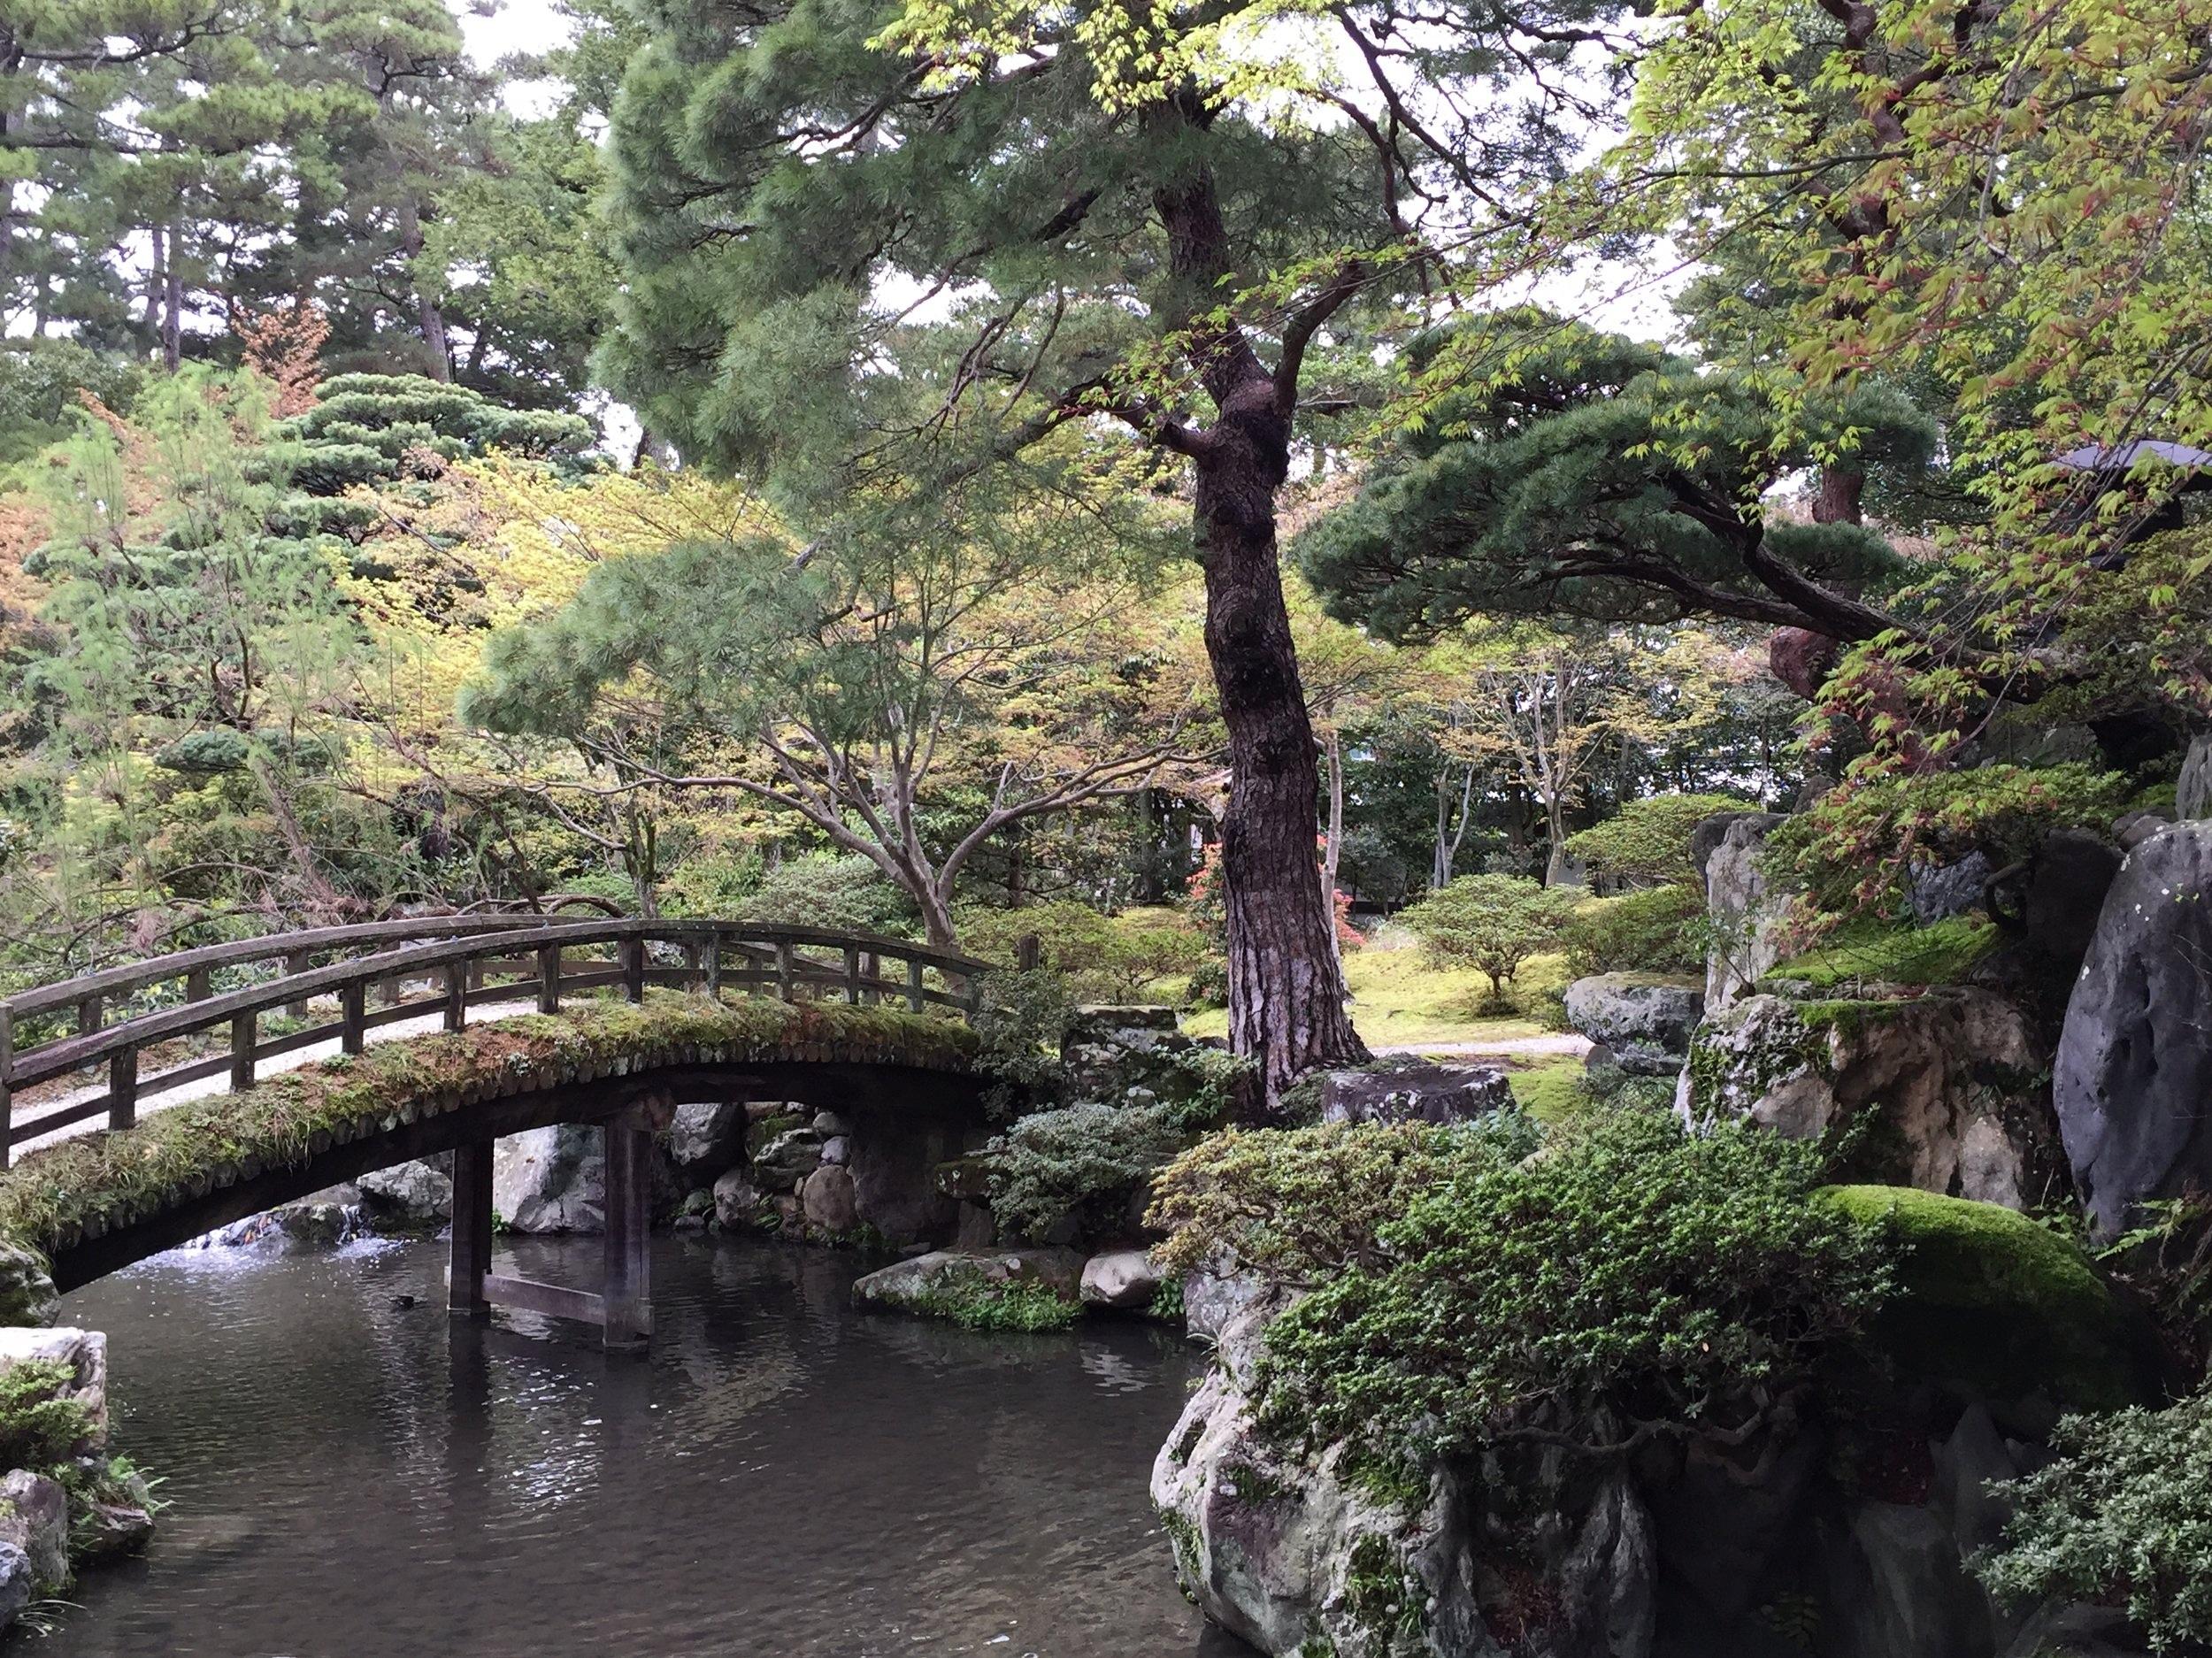 Kyoto Imperial Palace Gardens, Kyoto, Japan